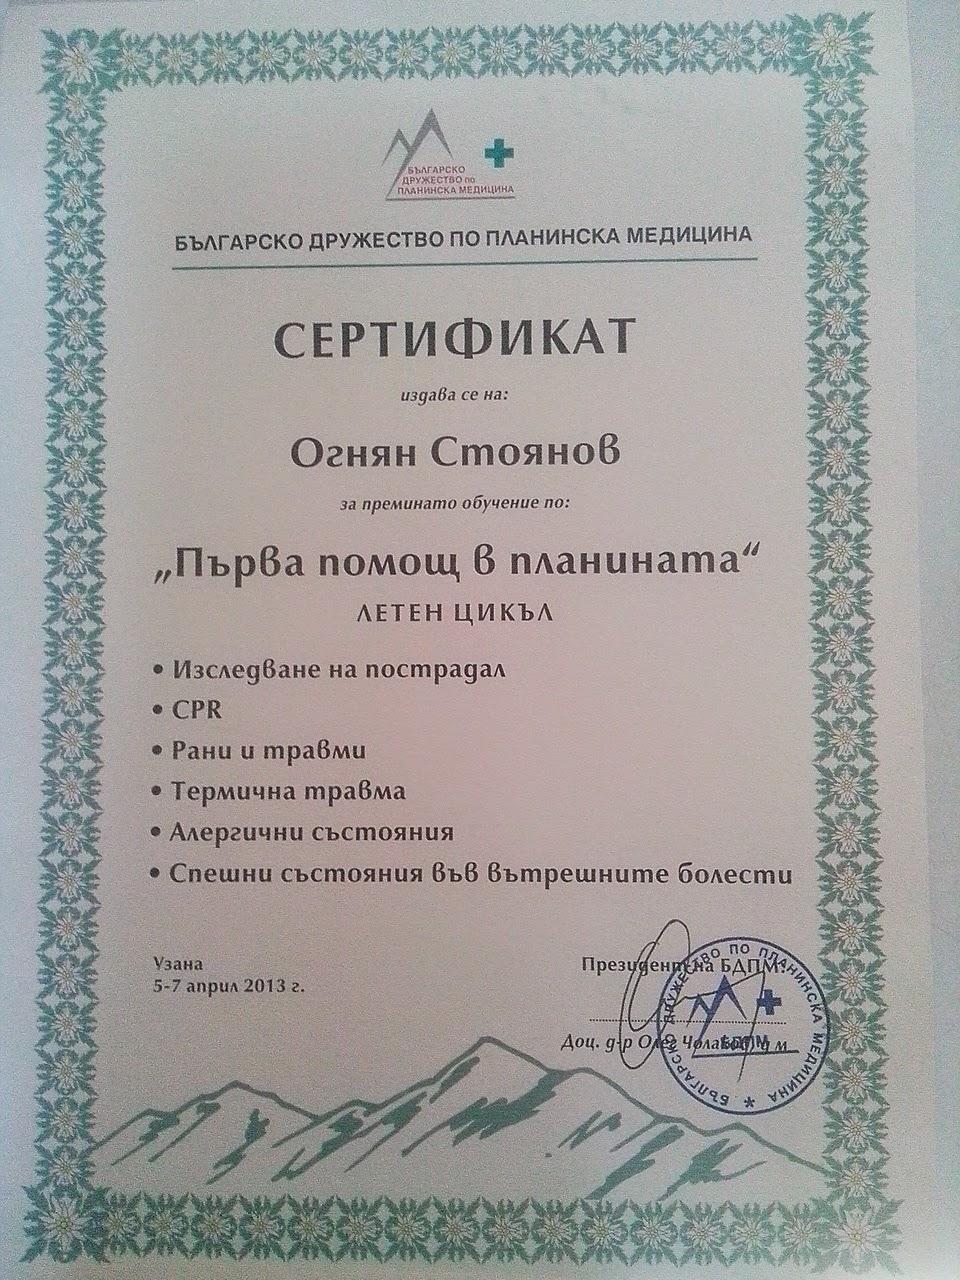 , About me, OC Stoyanov